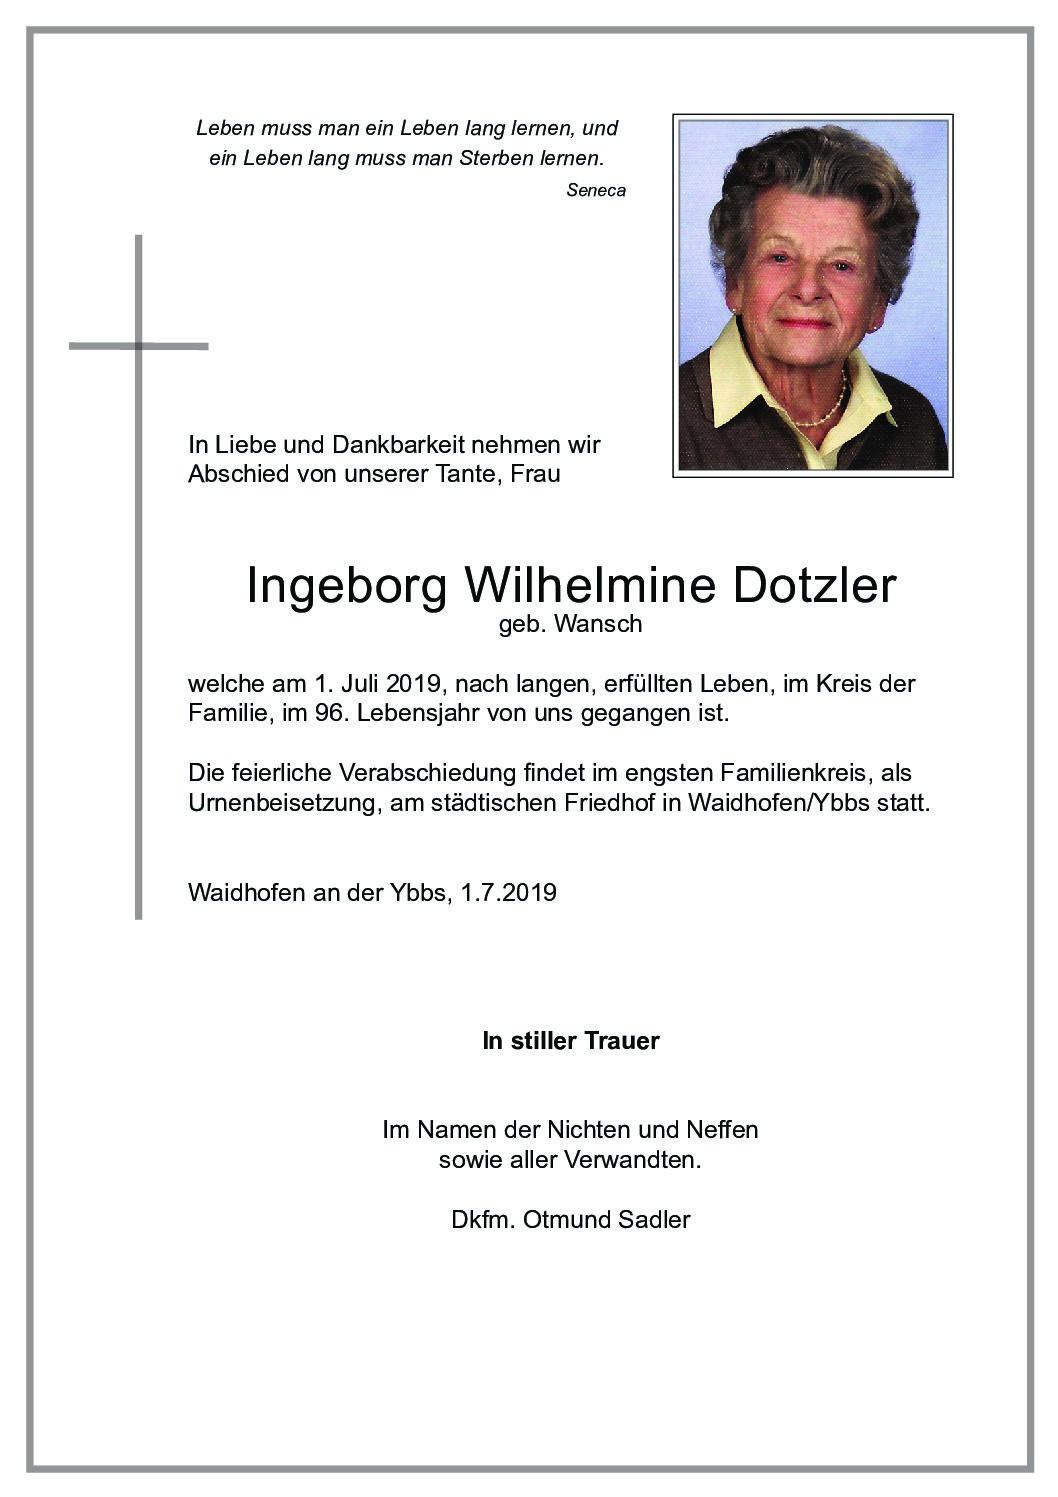 Ingeborg Wilhelmine Dotzler